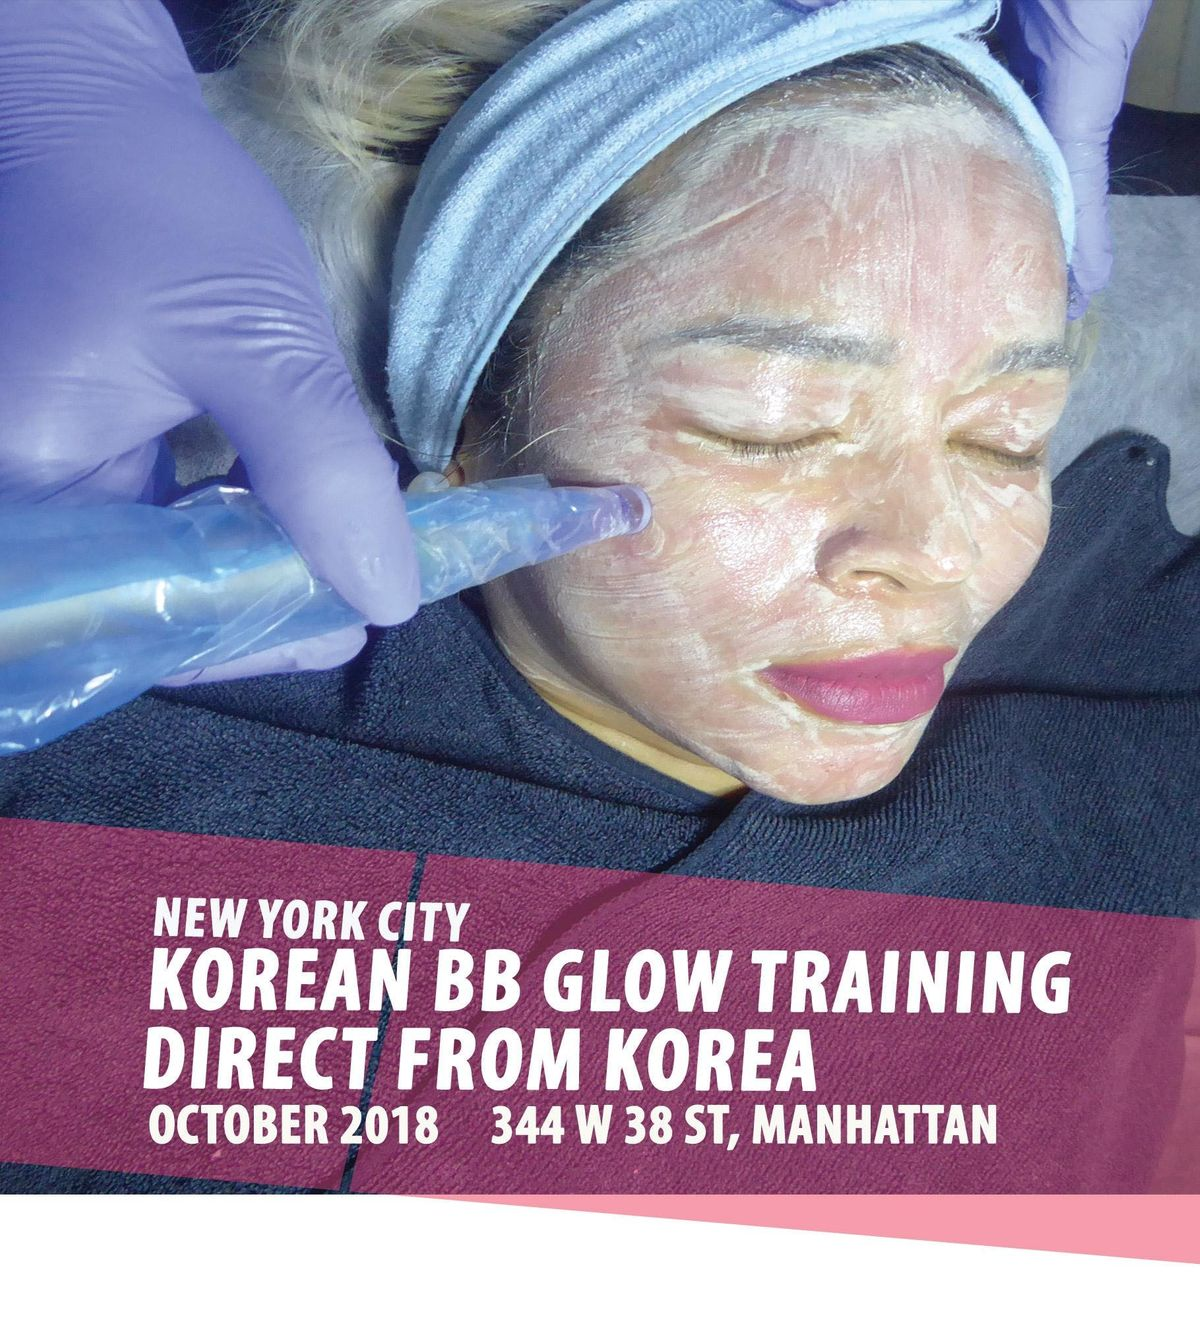 KOREAN WATERSHINE FULL BB GLOW TRAINING at 344 W 38th St